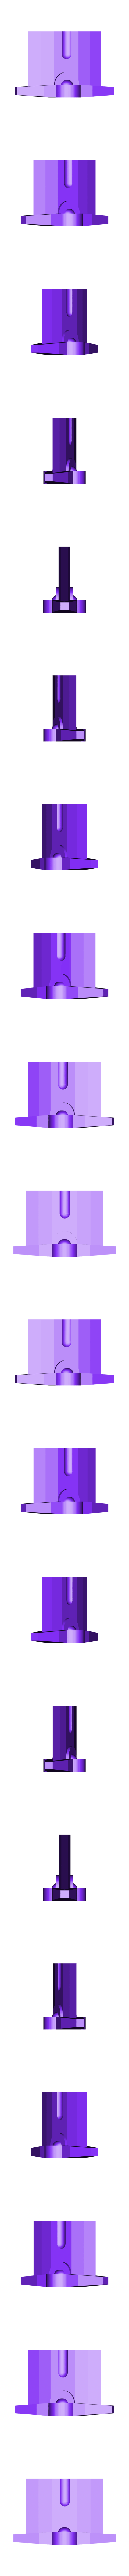 Sword Blade Bottom.stl Download free STL file 3D Long Sword • 3D print template, Logtrimmer